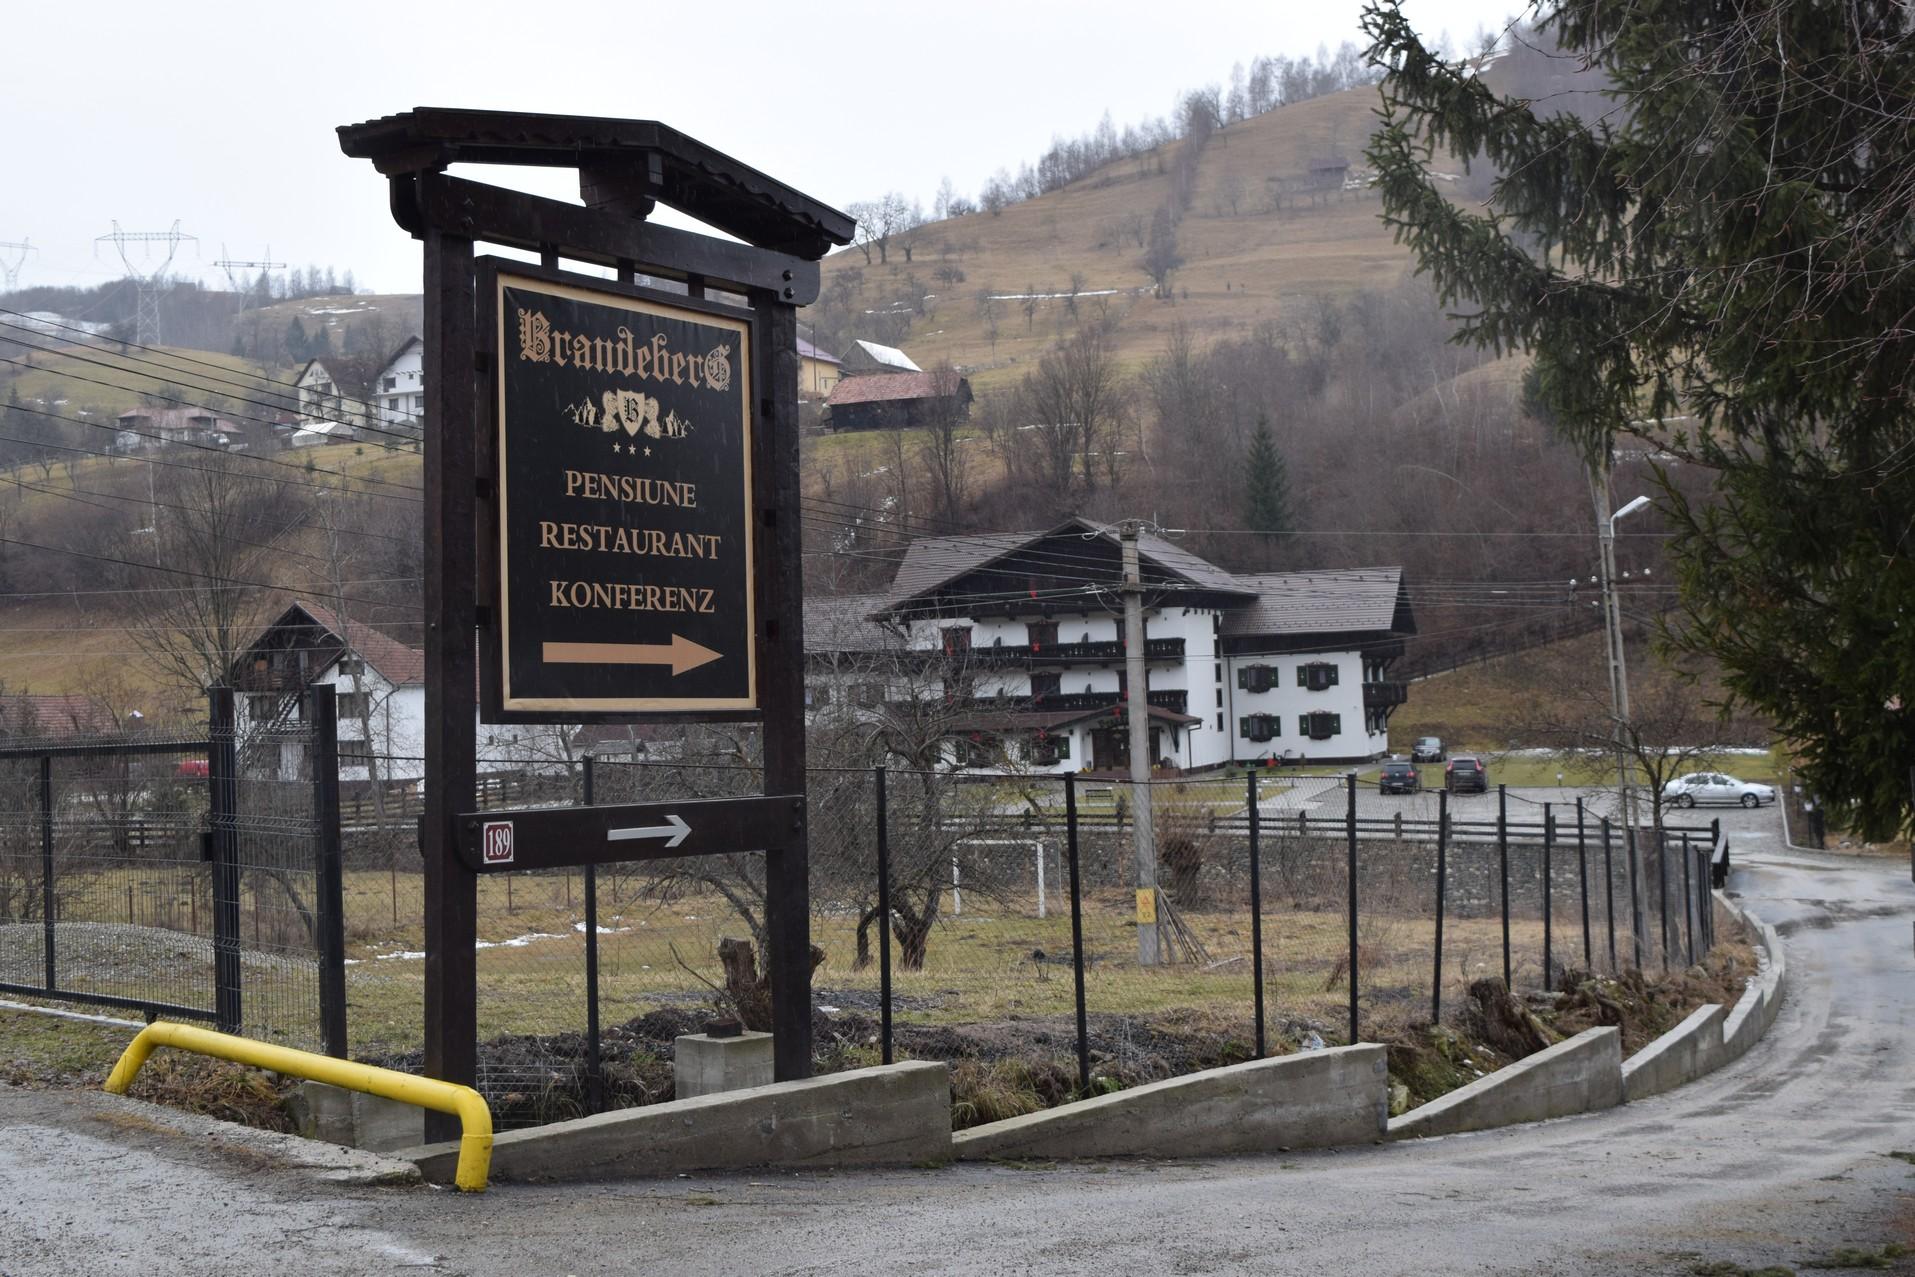 Brandeberg pension